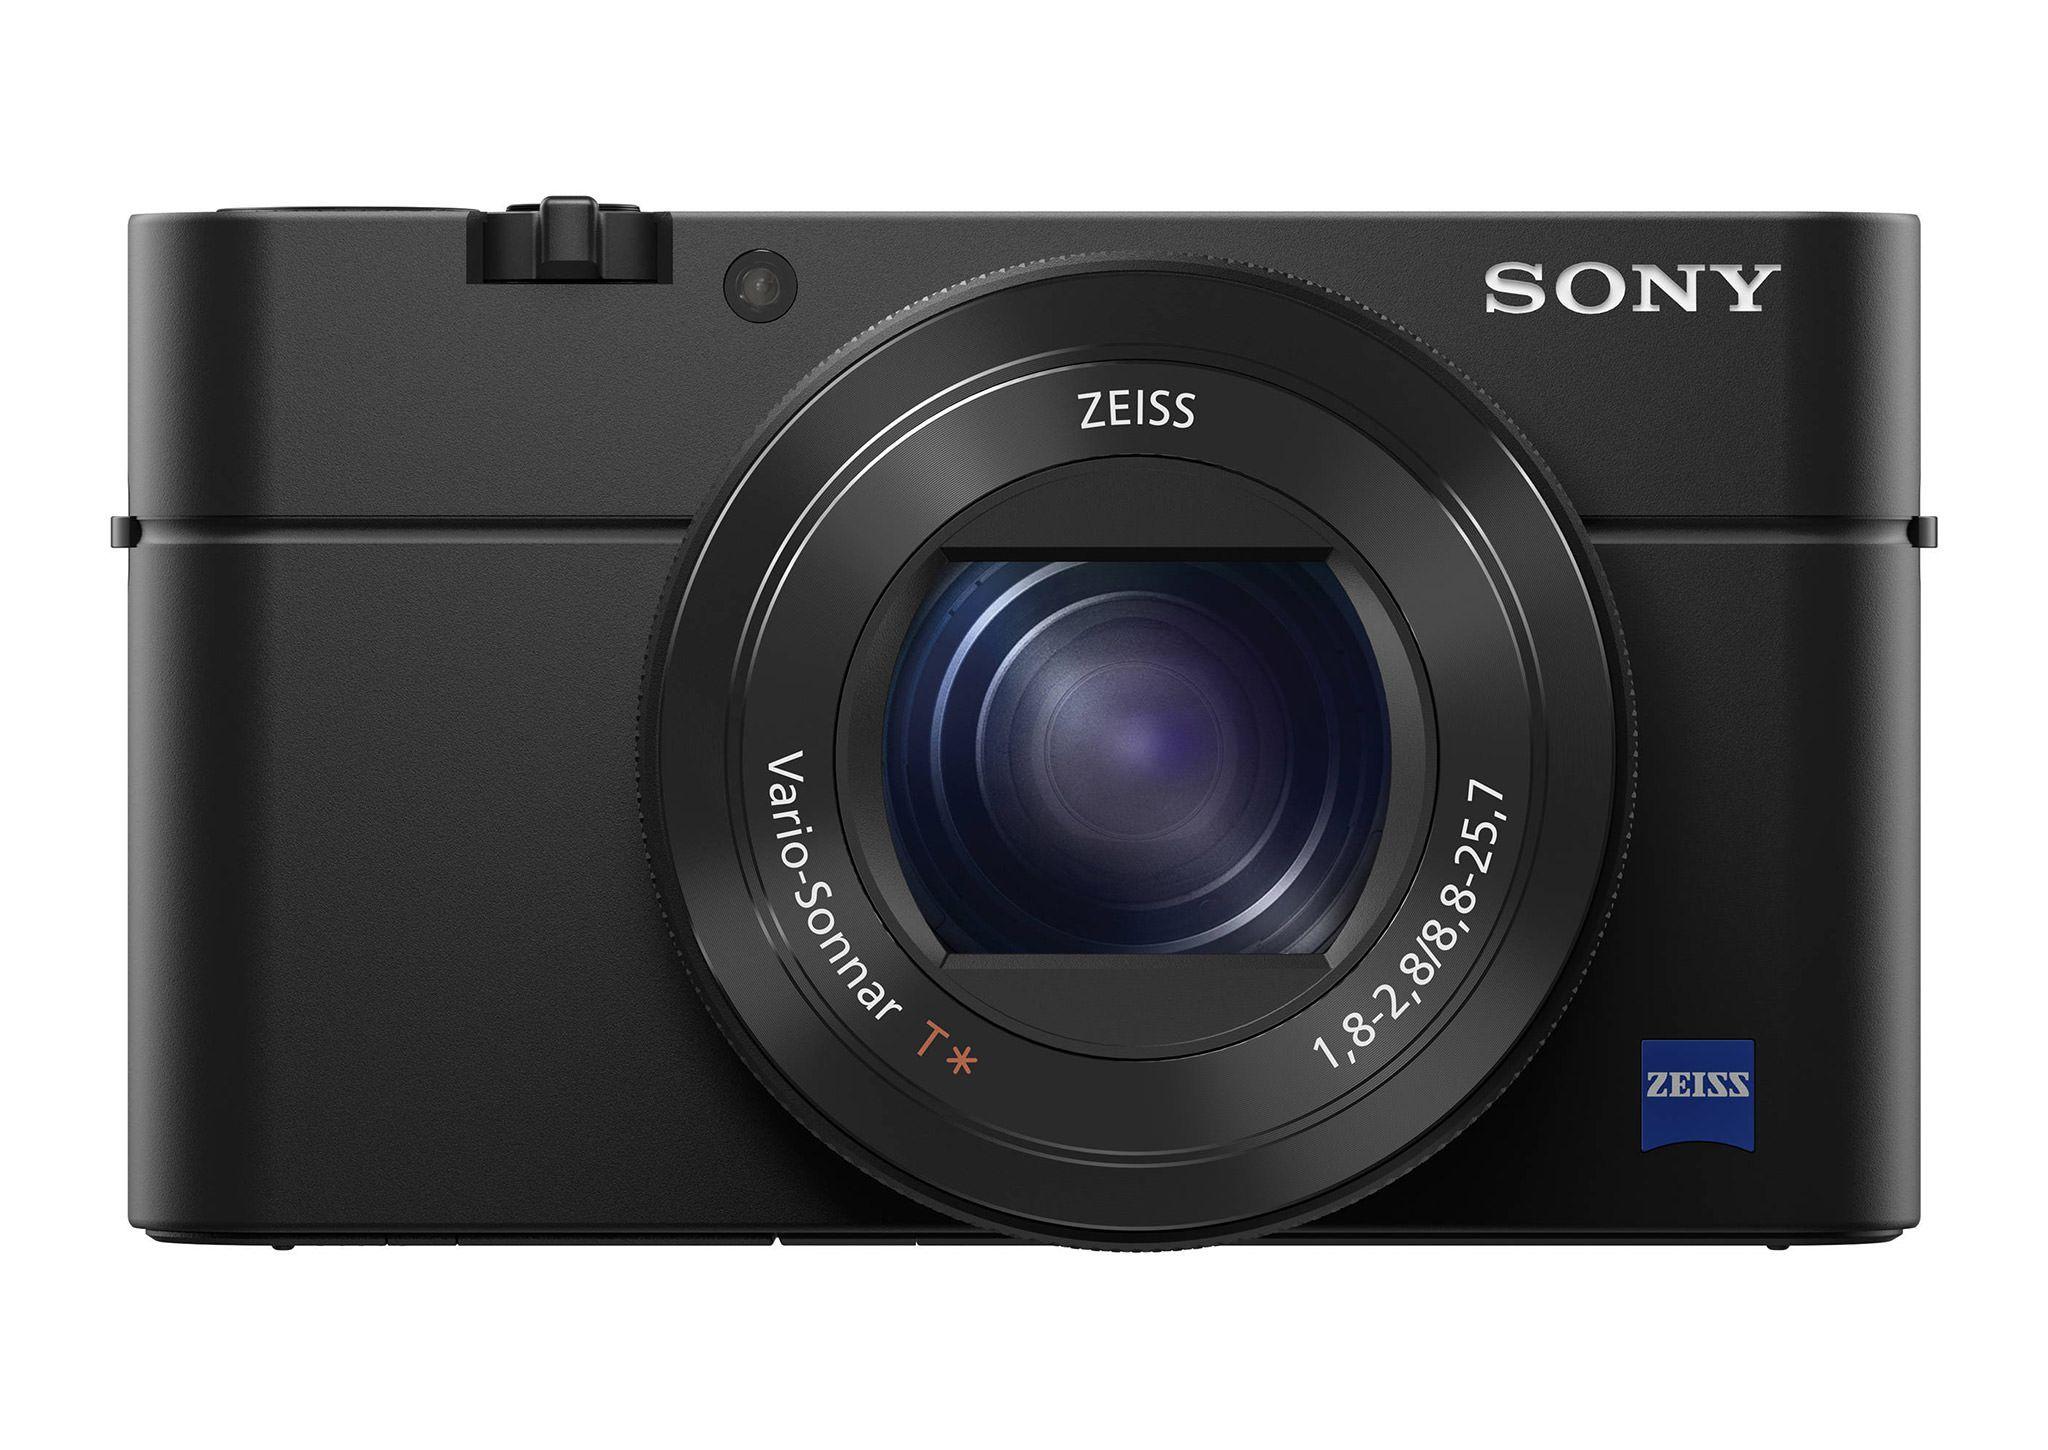 Sony Rx100 Series Comparison I Ii Iii And Iv Compact Digital Camera Sony Cybershot Still Camera